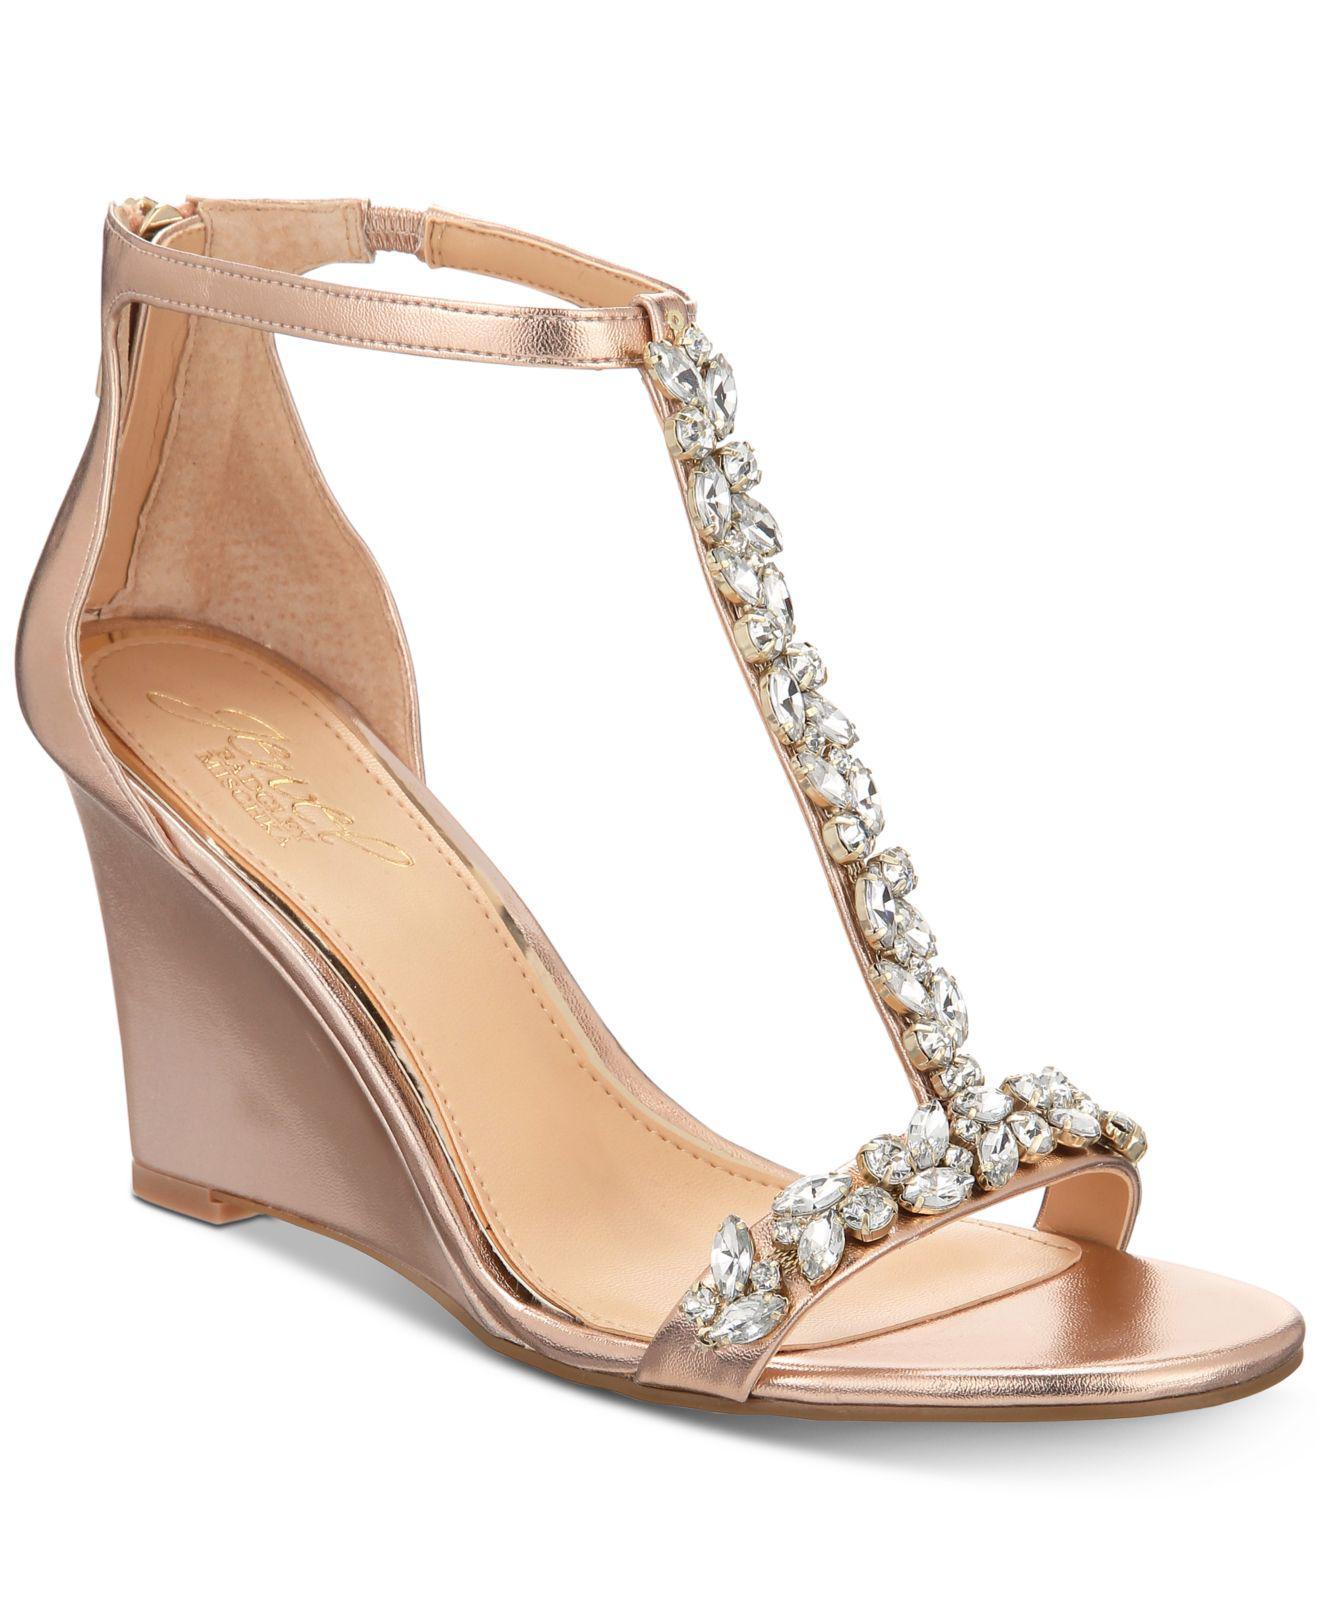 f1ca1c0ba0f Lyst - Badgley Mischka Meryl Wedge Evening Sandals in Metallic